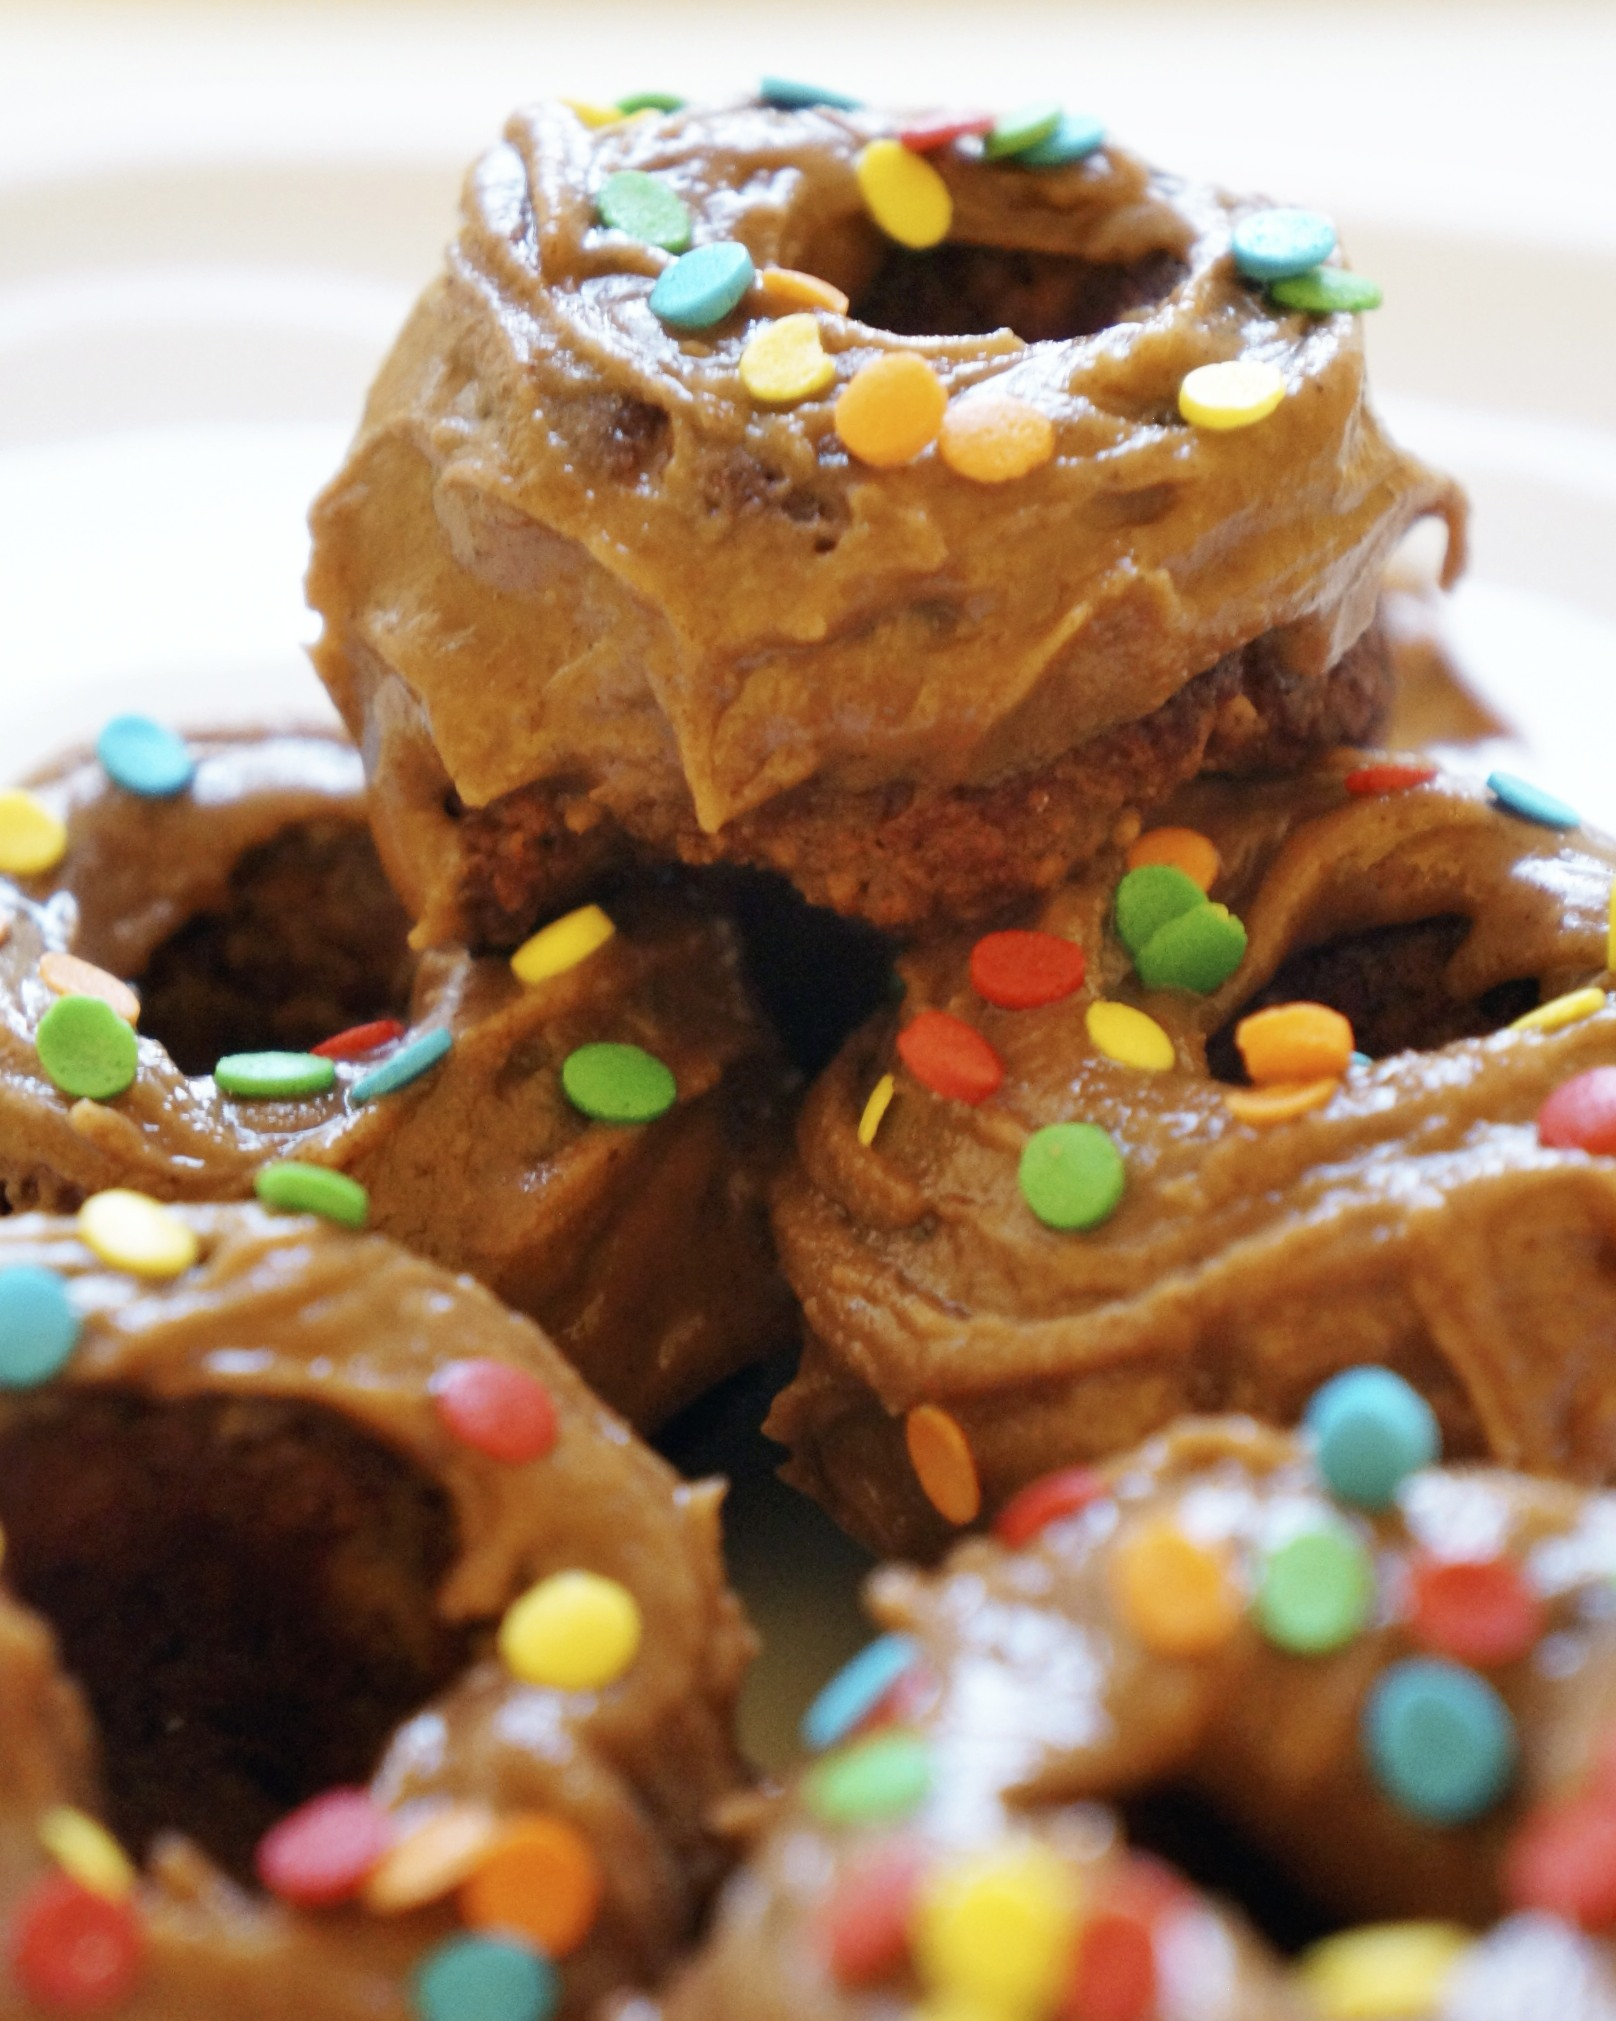 maple cinnamon doughnuts (vegan and gluten free) via sarahdigrazia.com